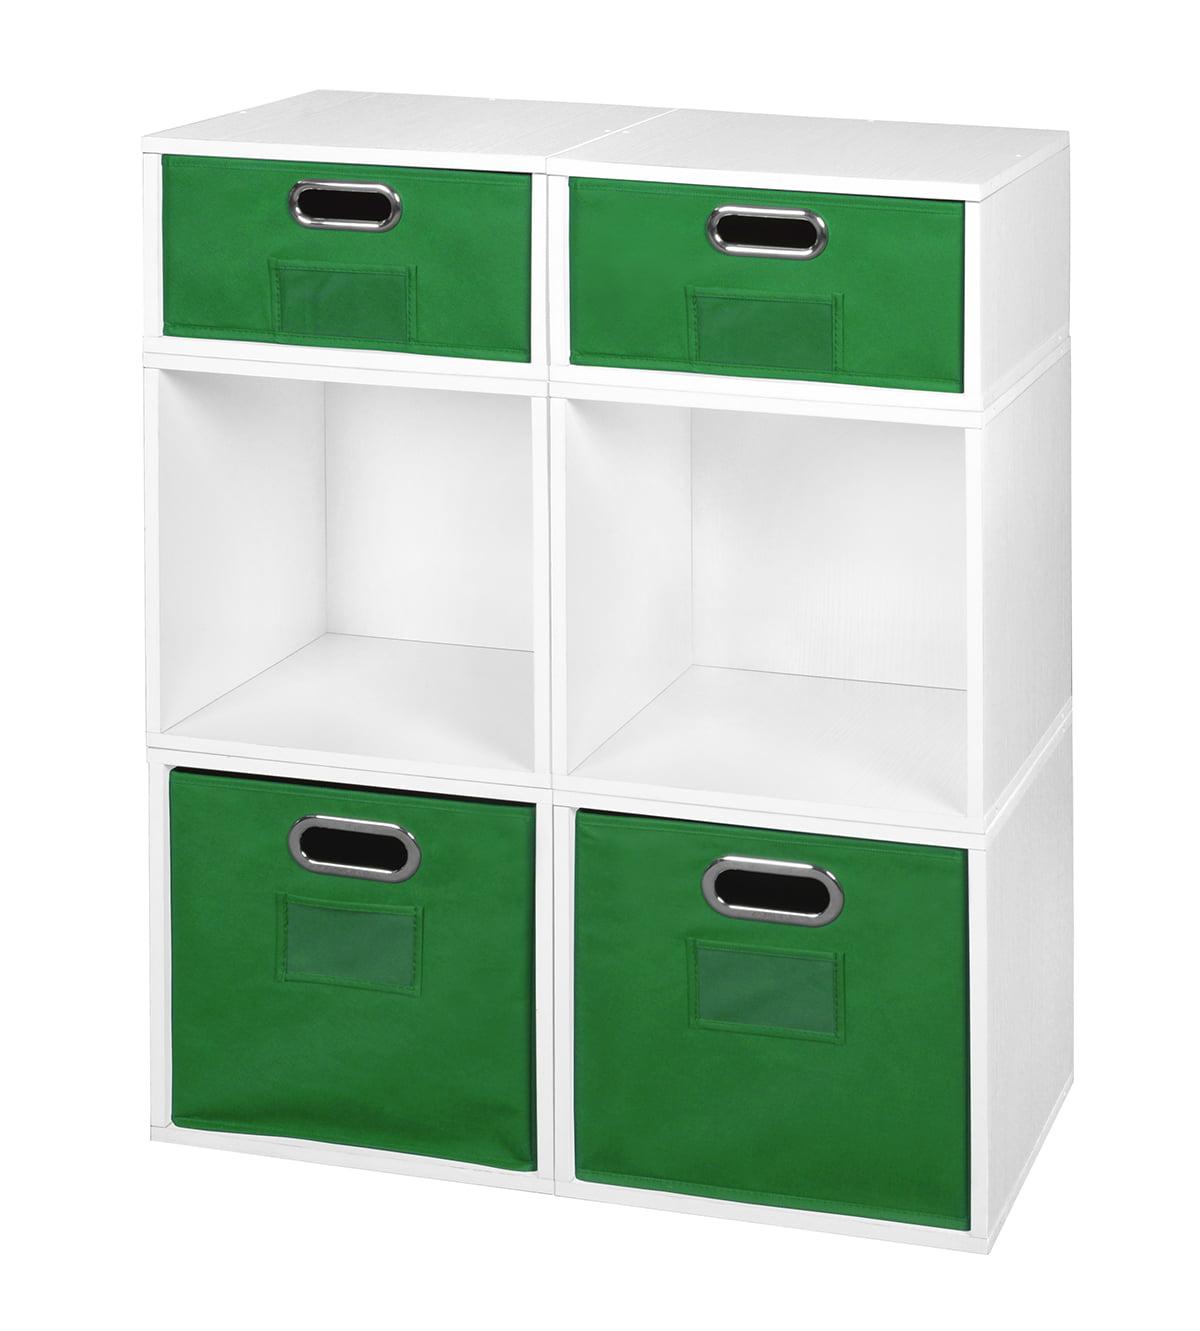 Niche Cubo Storage Set- 4 Full Cubes/2 Half Cubes with Foldable Storage Bins- White Wood Grain/Green